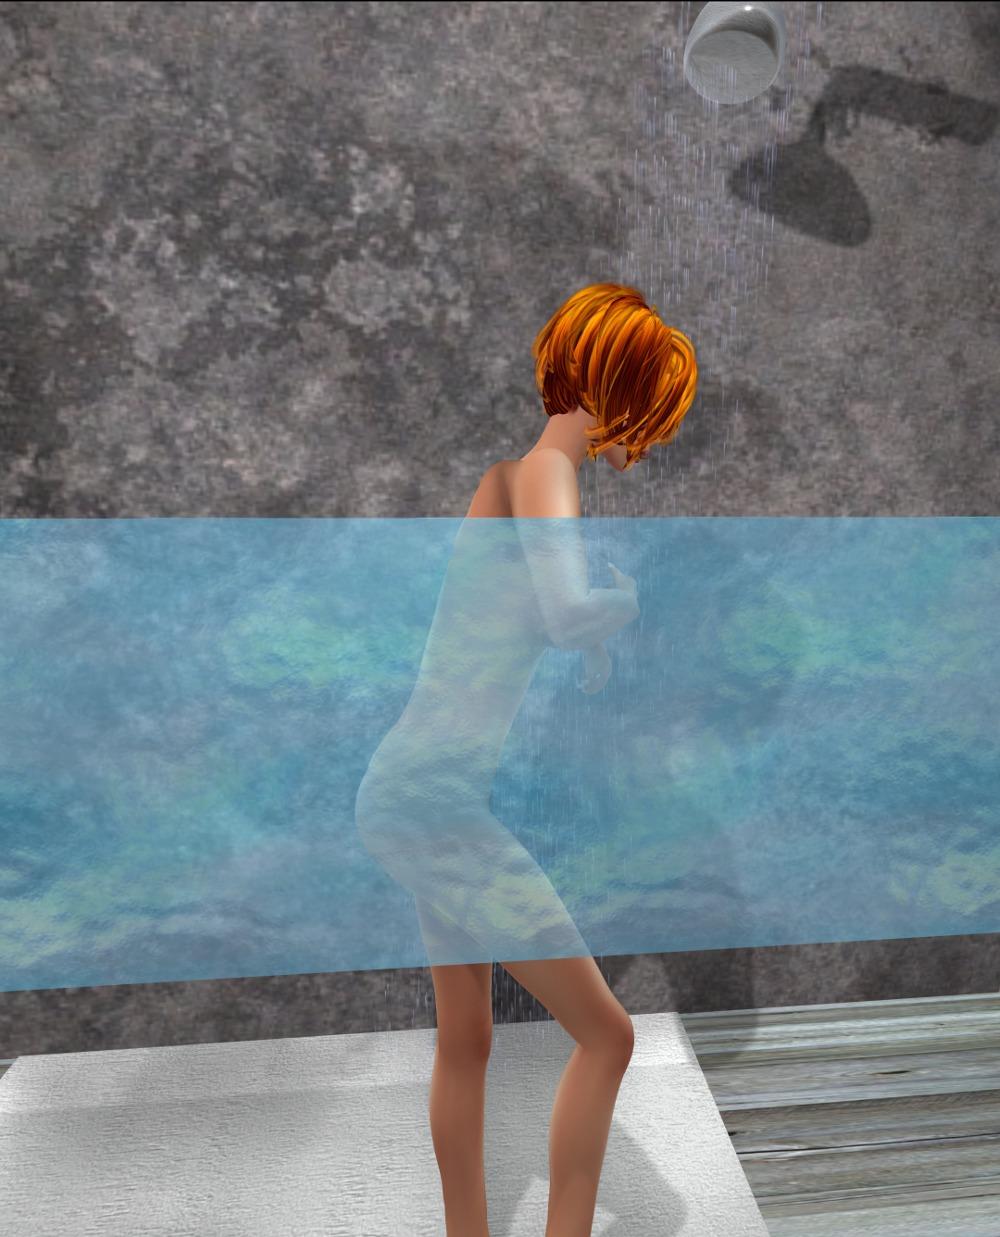 shower_005